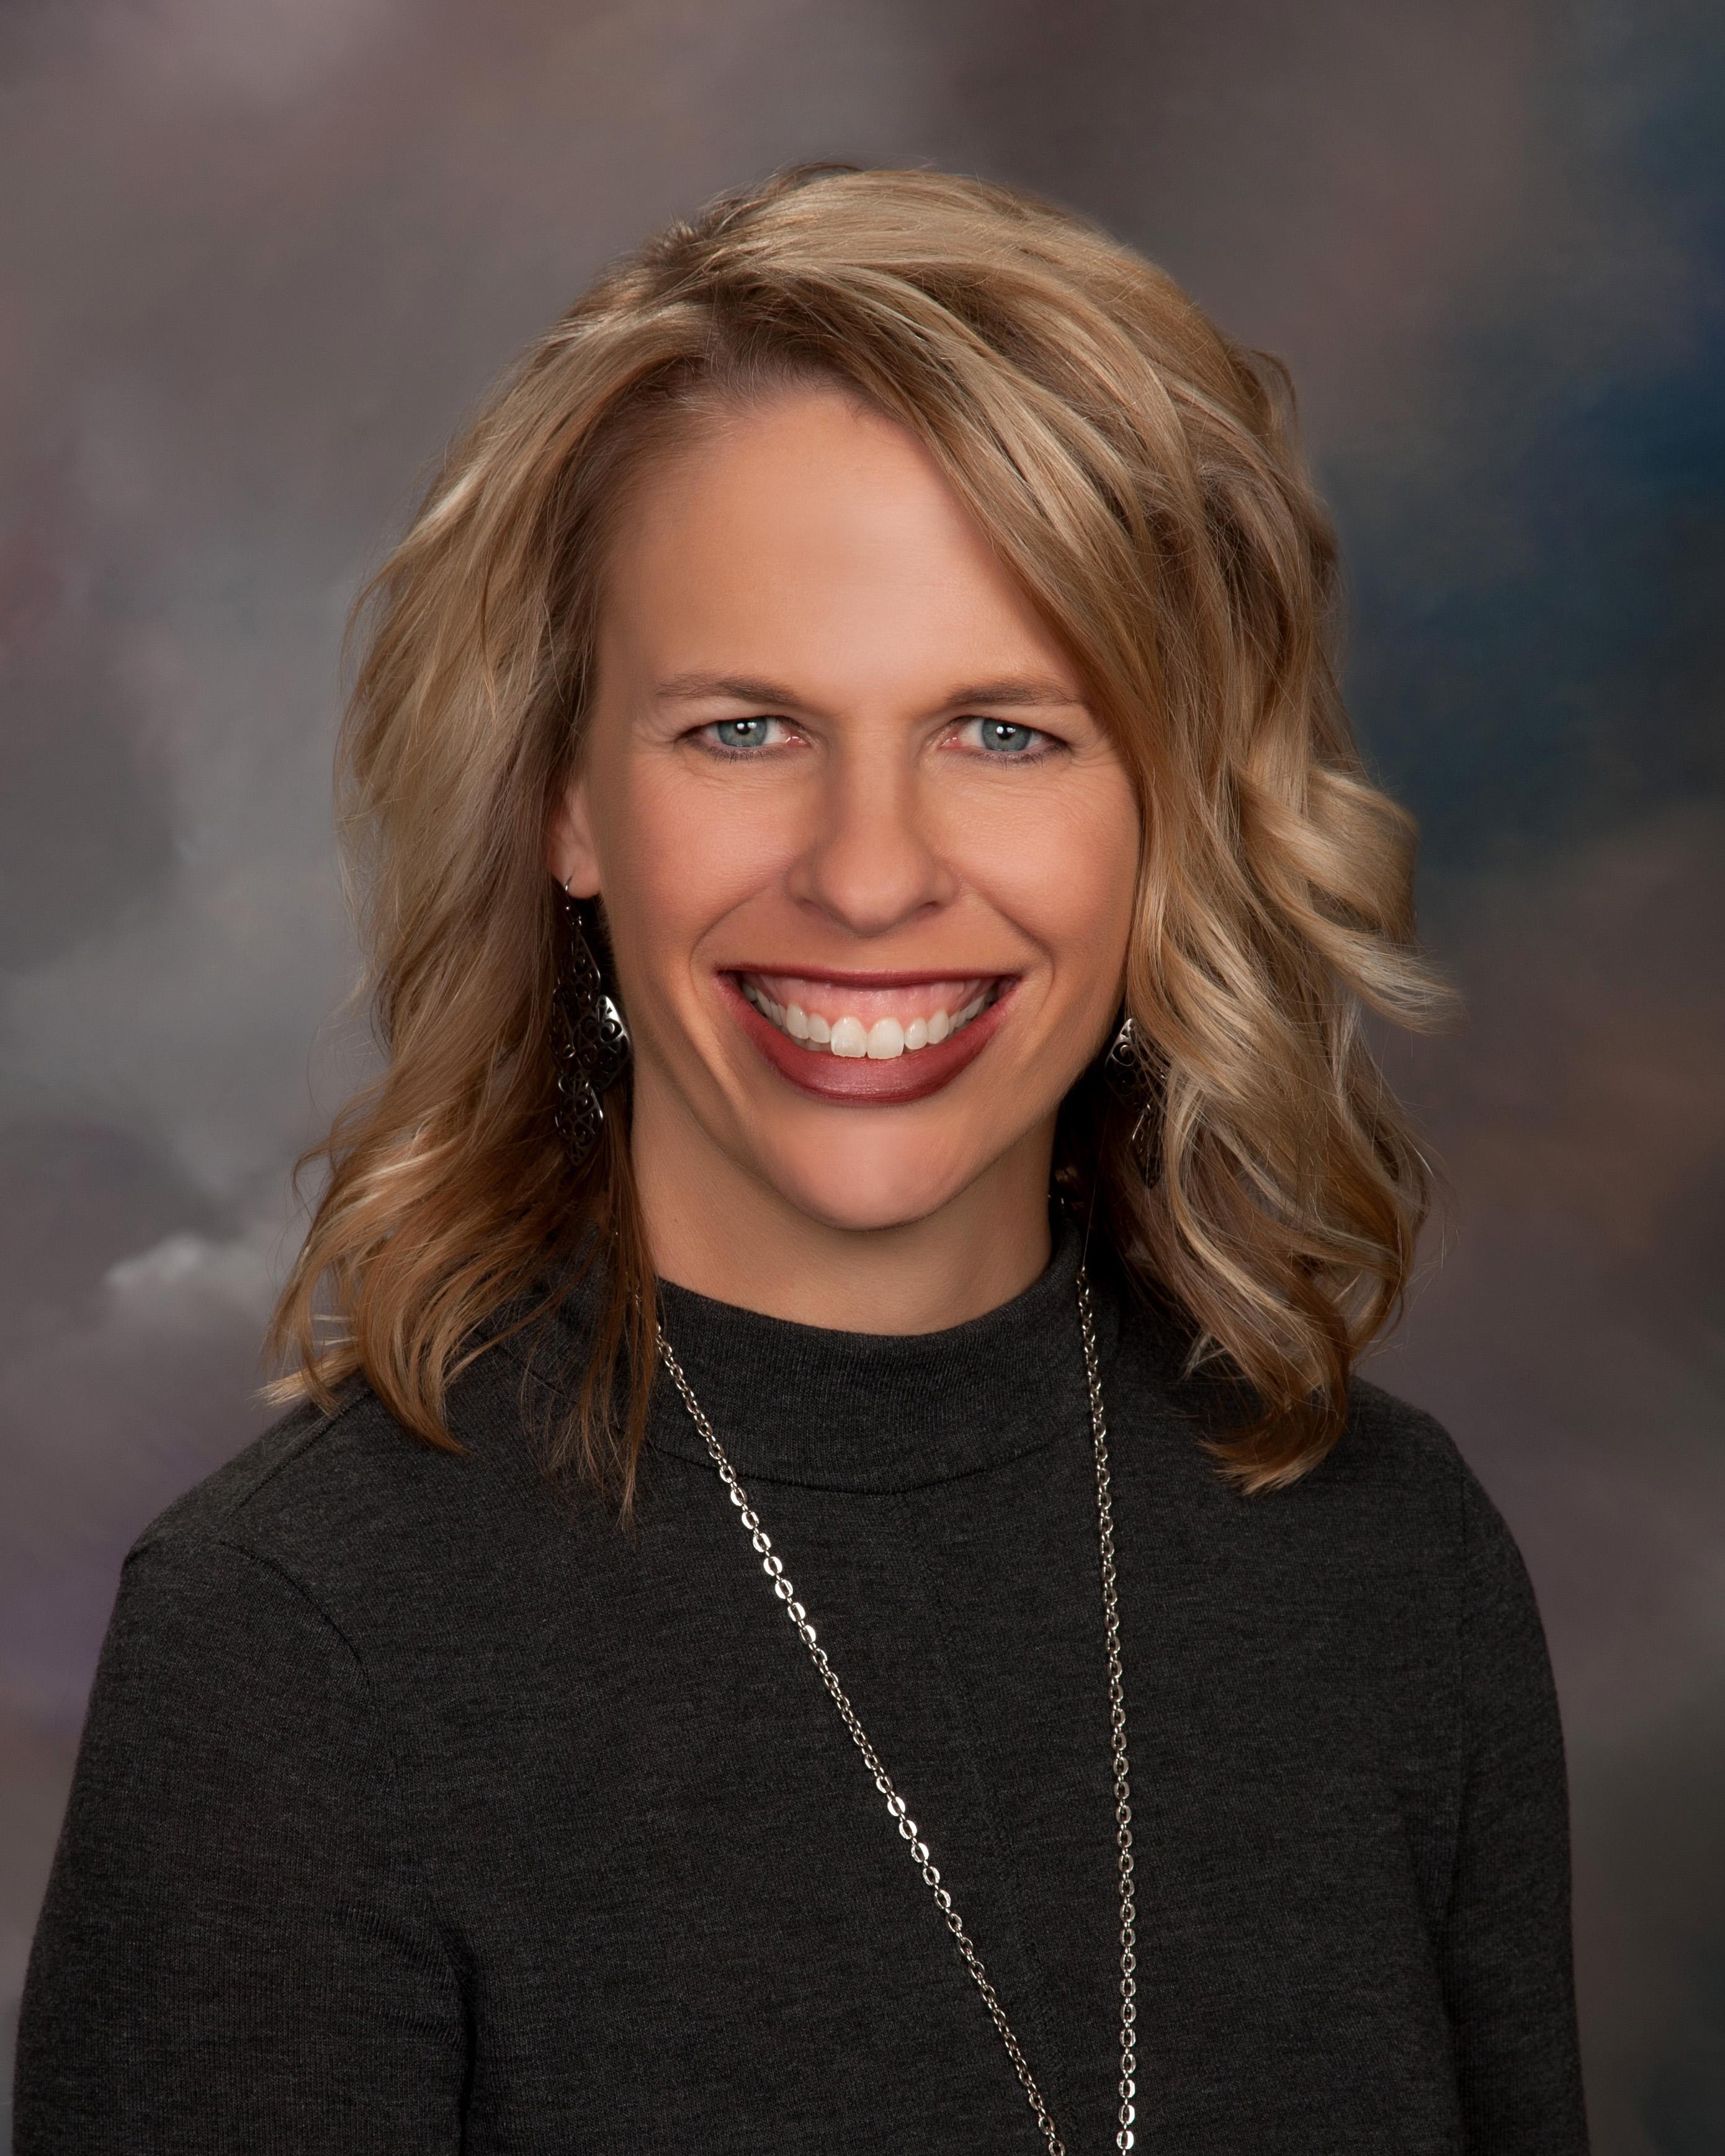 Event Q&A with Bismarck Cancer Center Marketing Director, Sara Kelsch